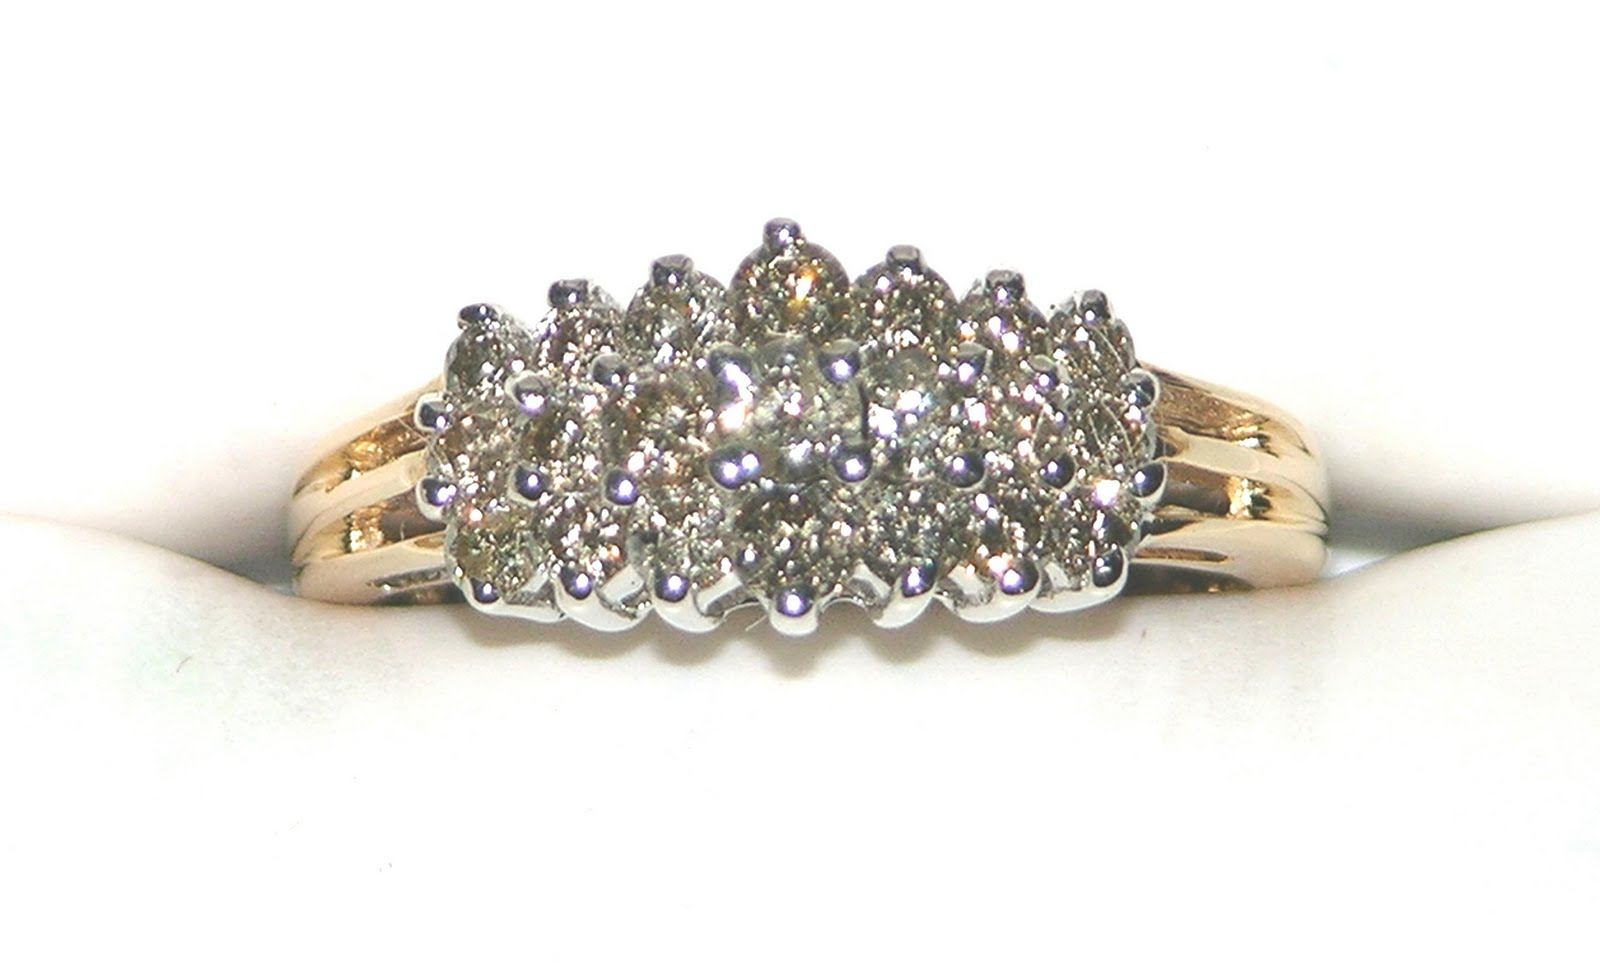 http://4.bp.blogspot.com/-l9kMZGFG1QY/Tbu56J2T3wI/AAAAAAAAAX4/gnhWgokEz8s/s1600/Diamond_Ring_DIR001.jpg